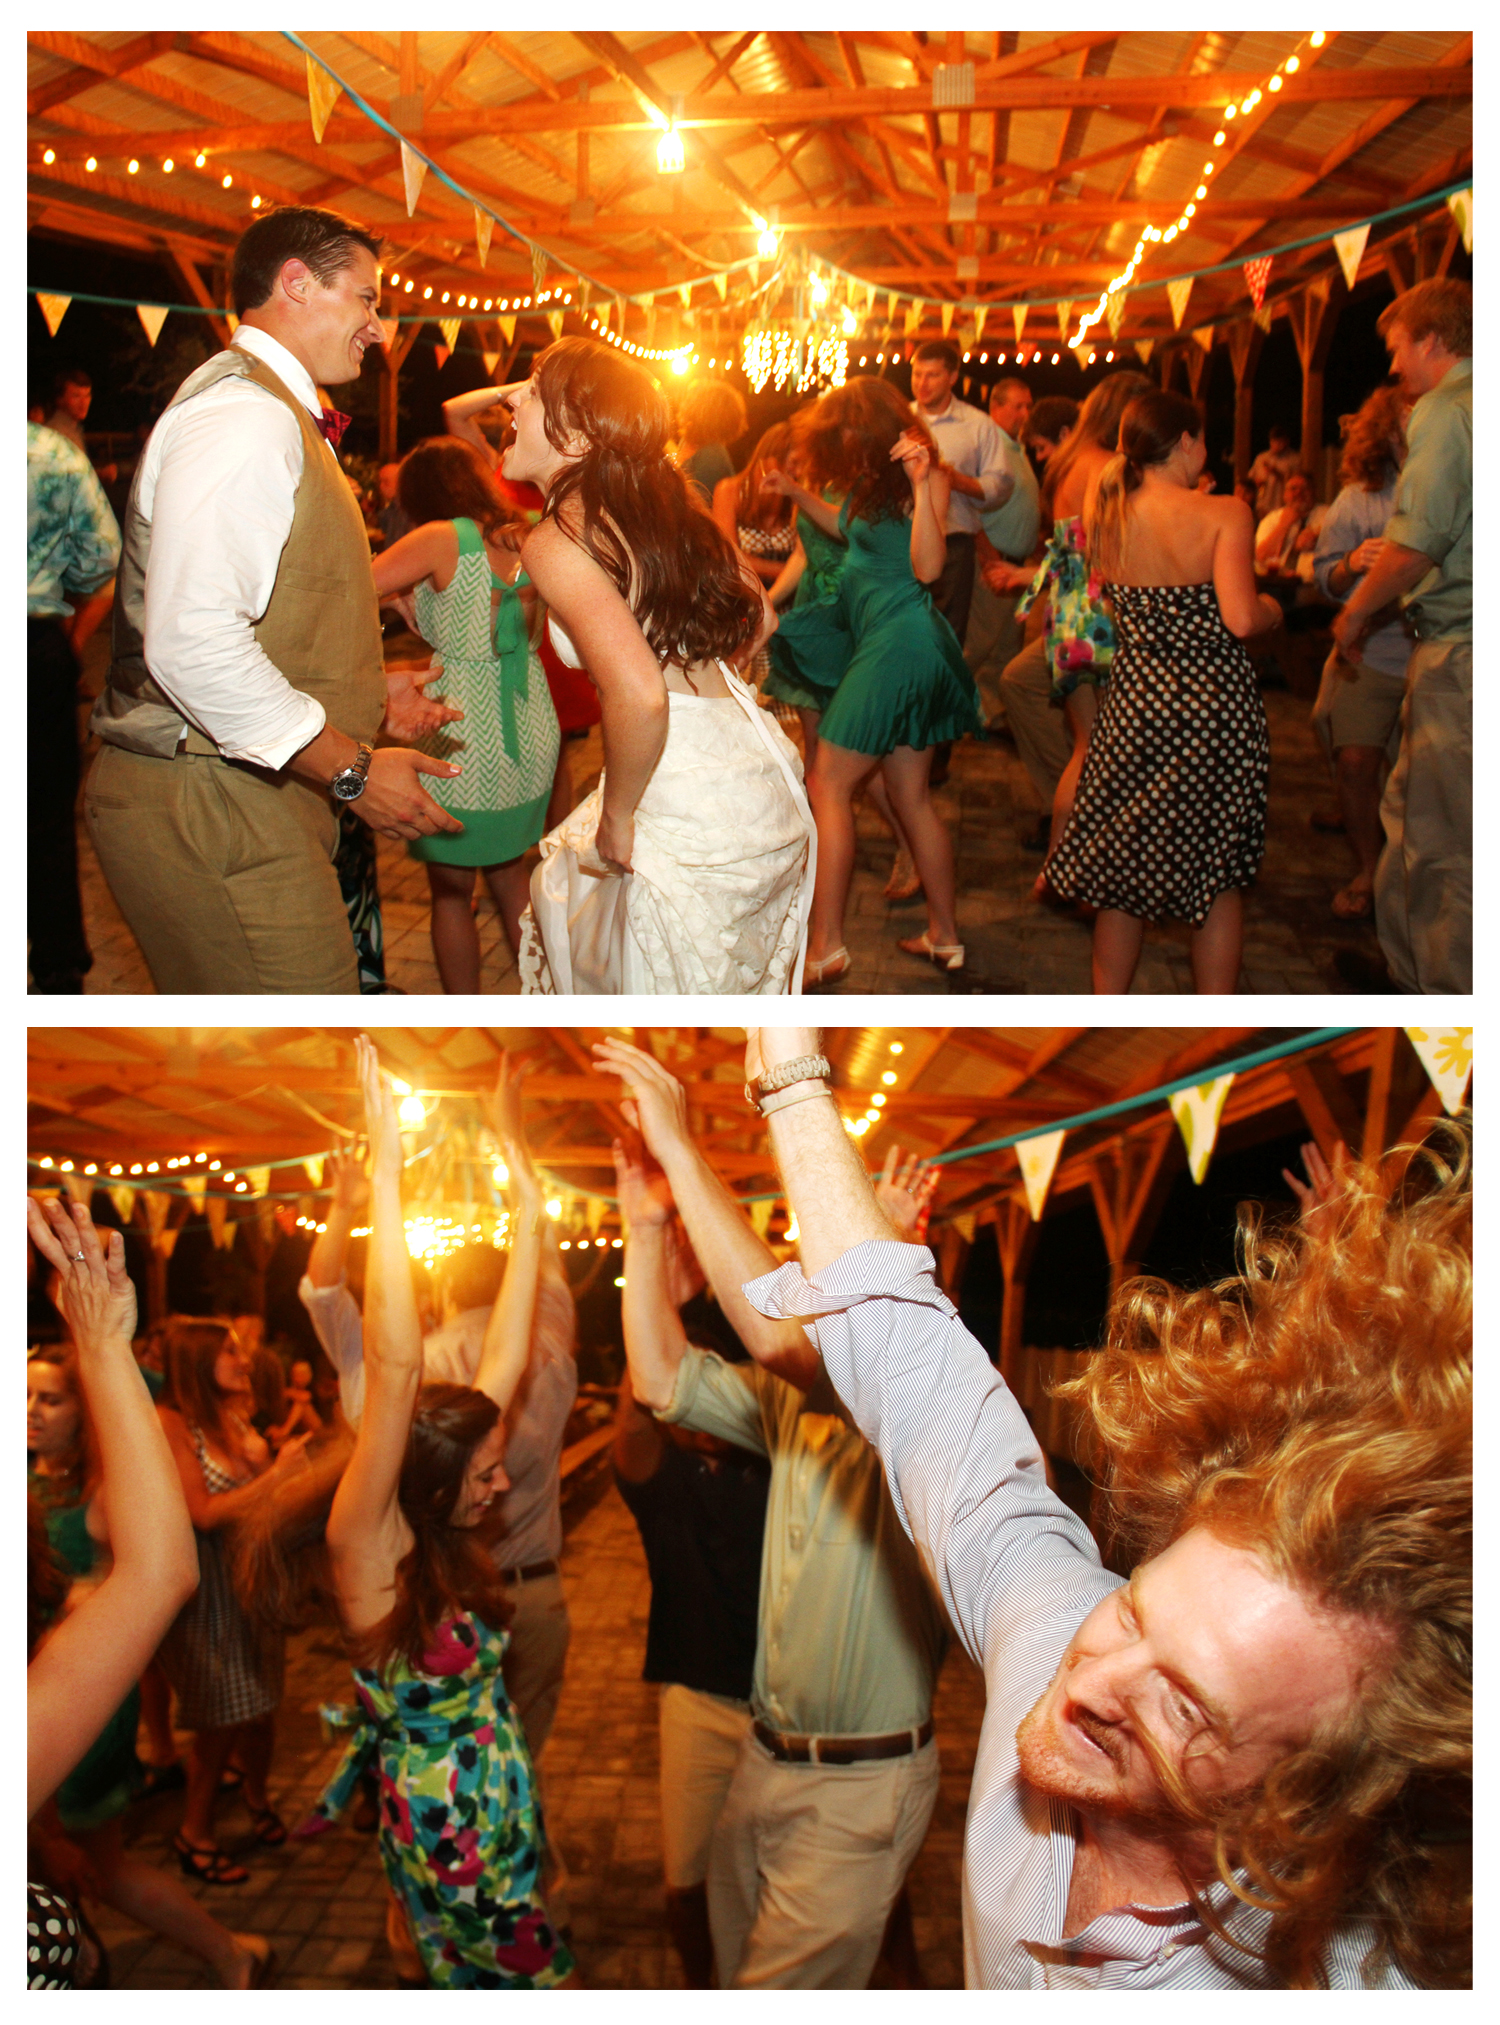 Collage - Dancing.jpg